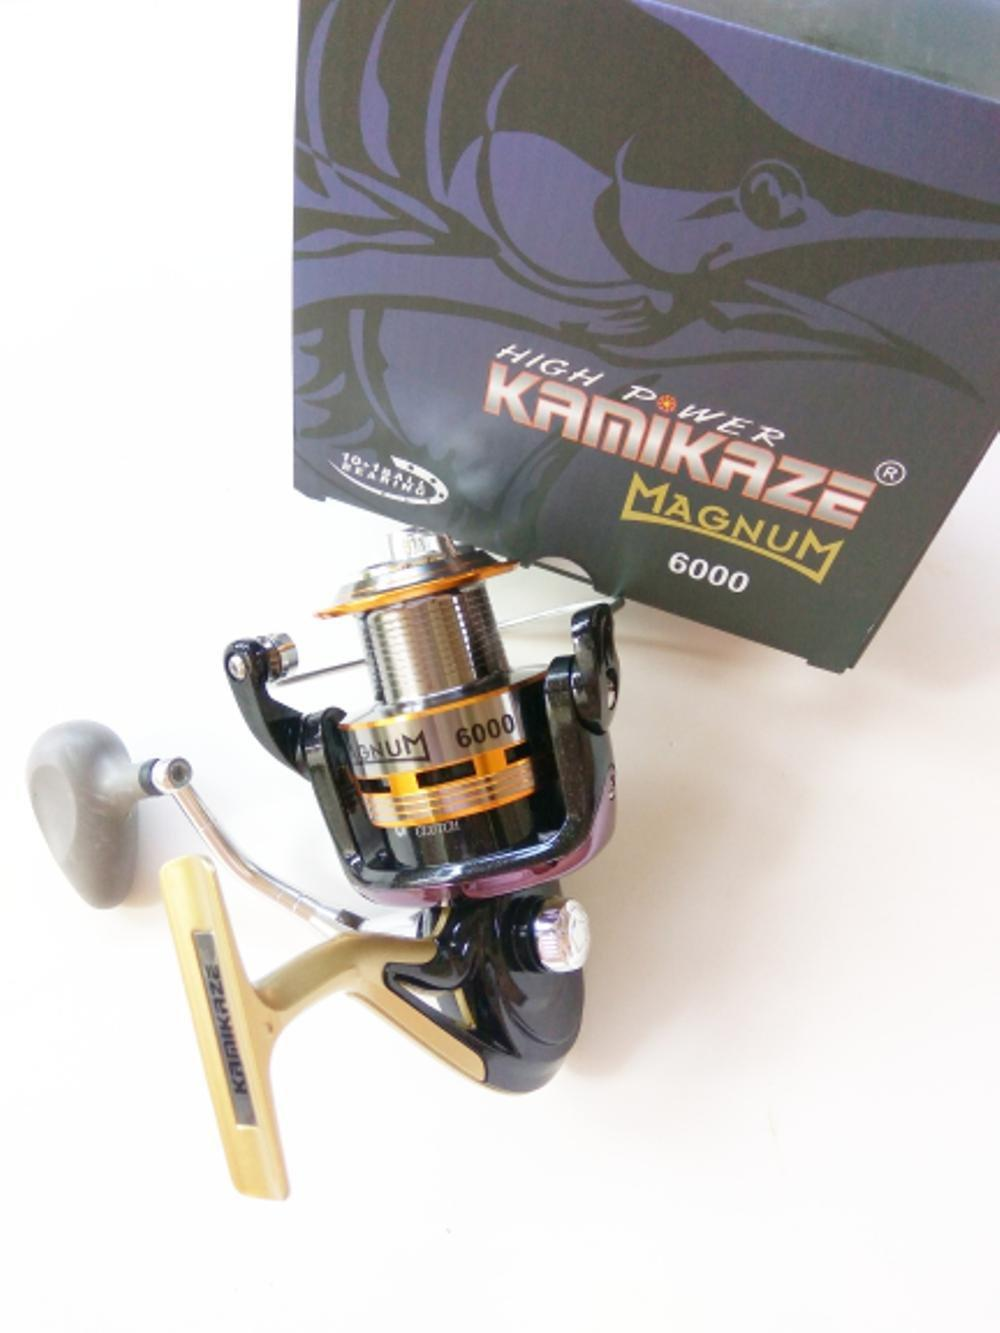 Reel Spinning Kamikaze Magnum 6000 11 BB